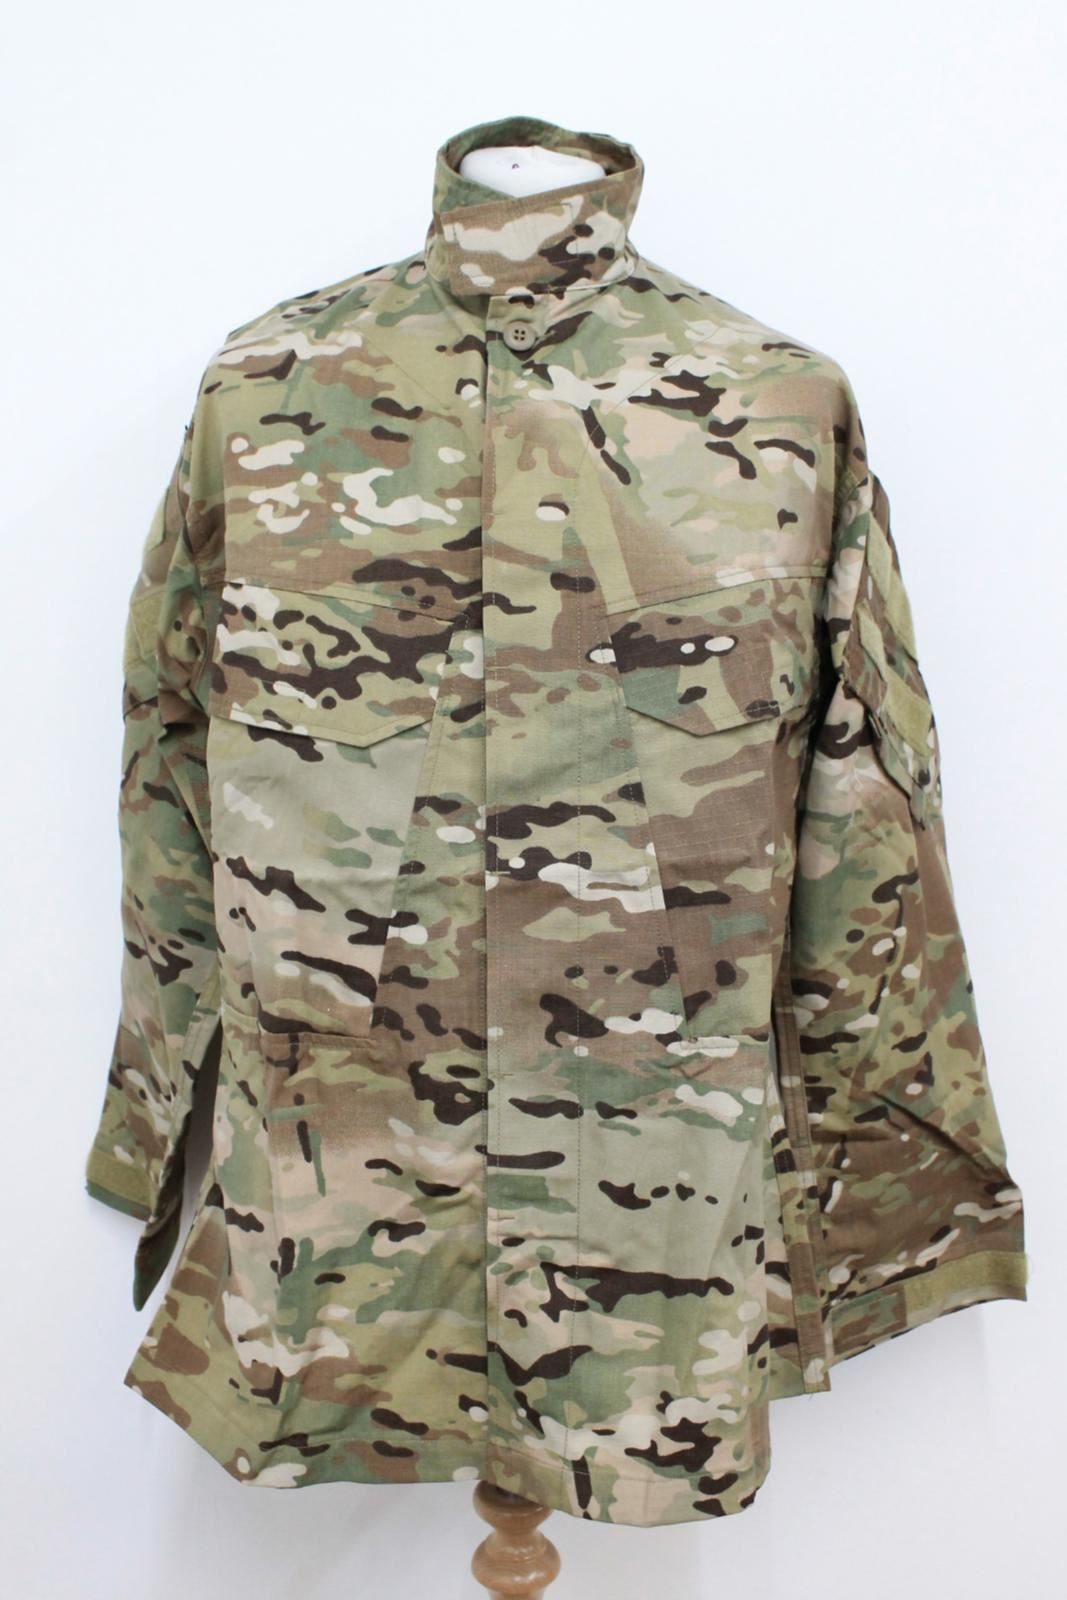 BNWT CYRE PRECISION Men's G3 Field Multicam Long Sleeve Military Shirt Size MD R